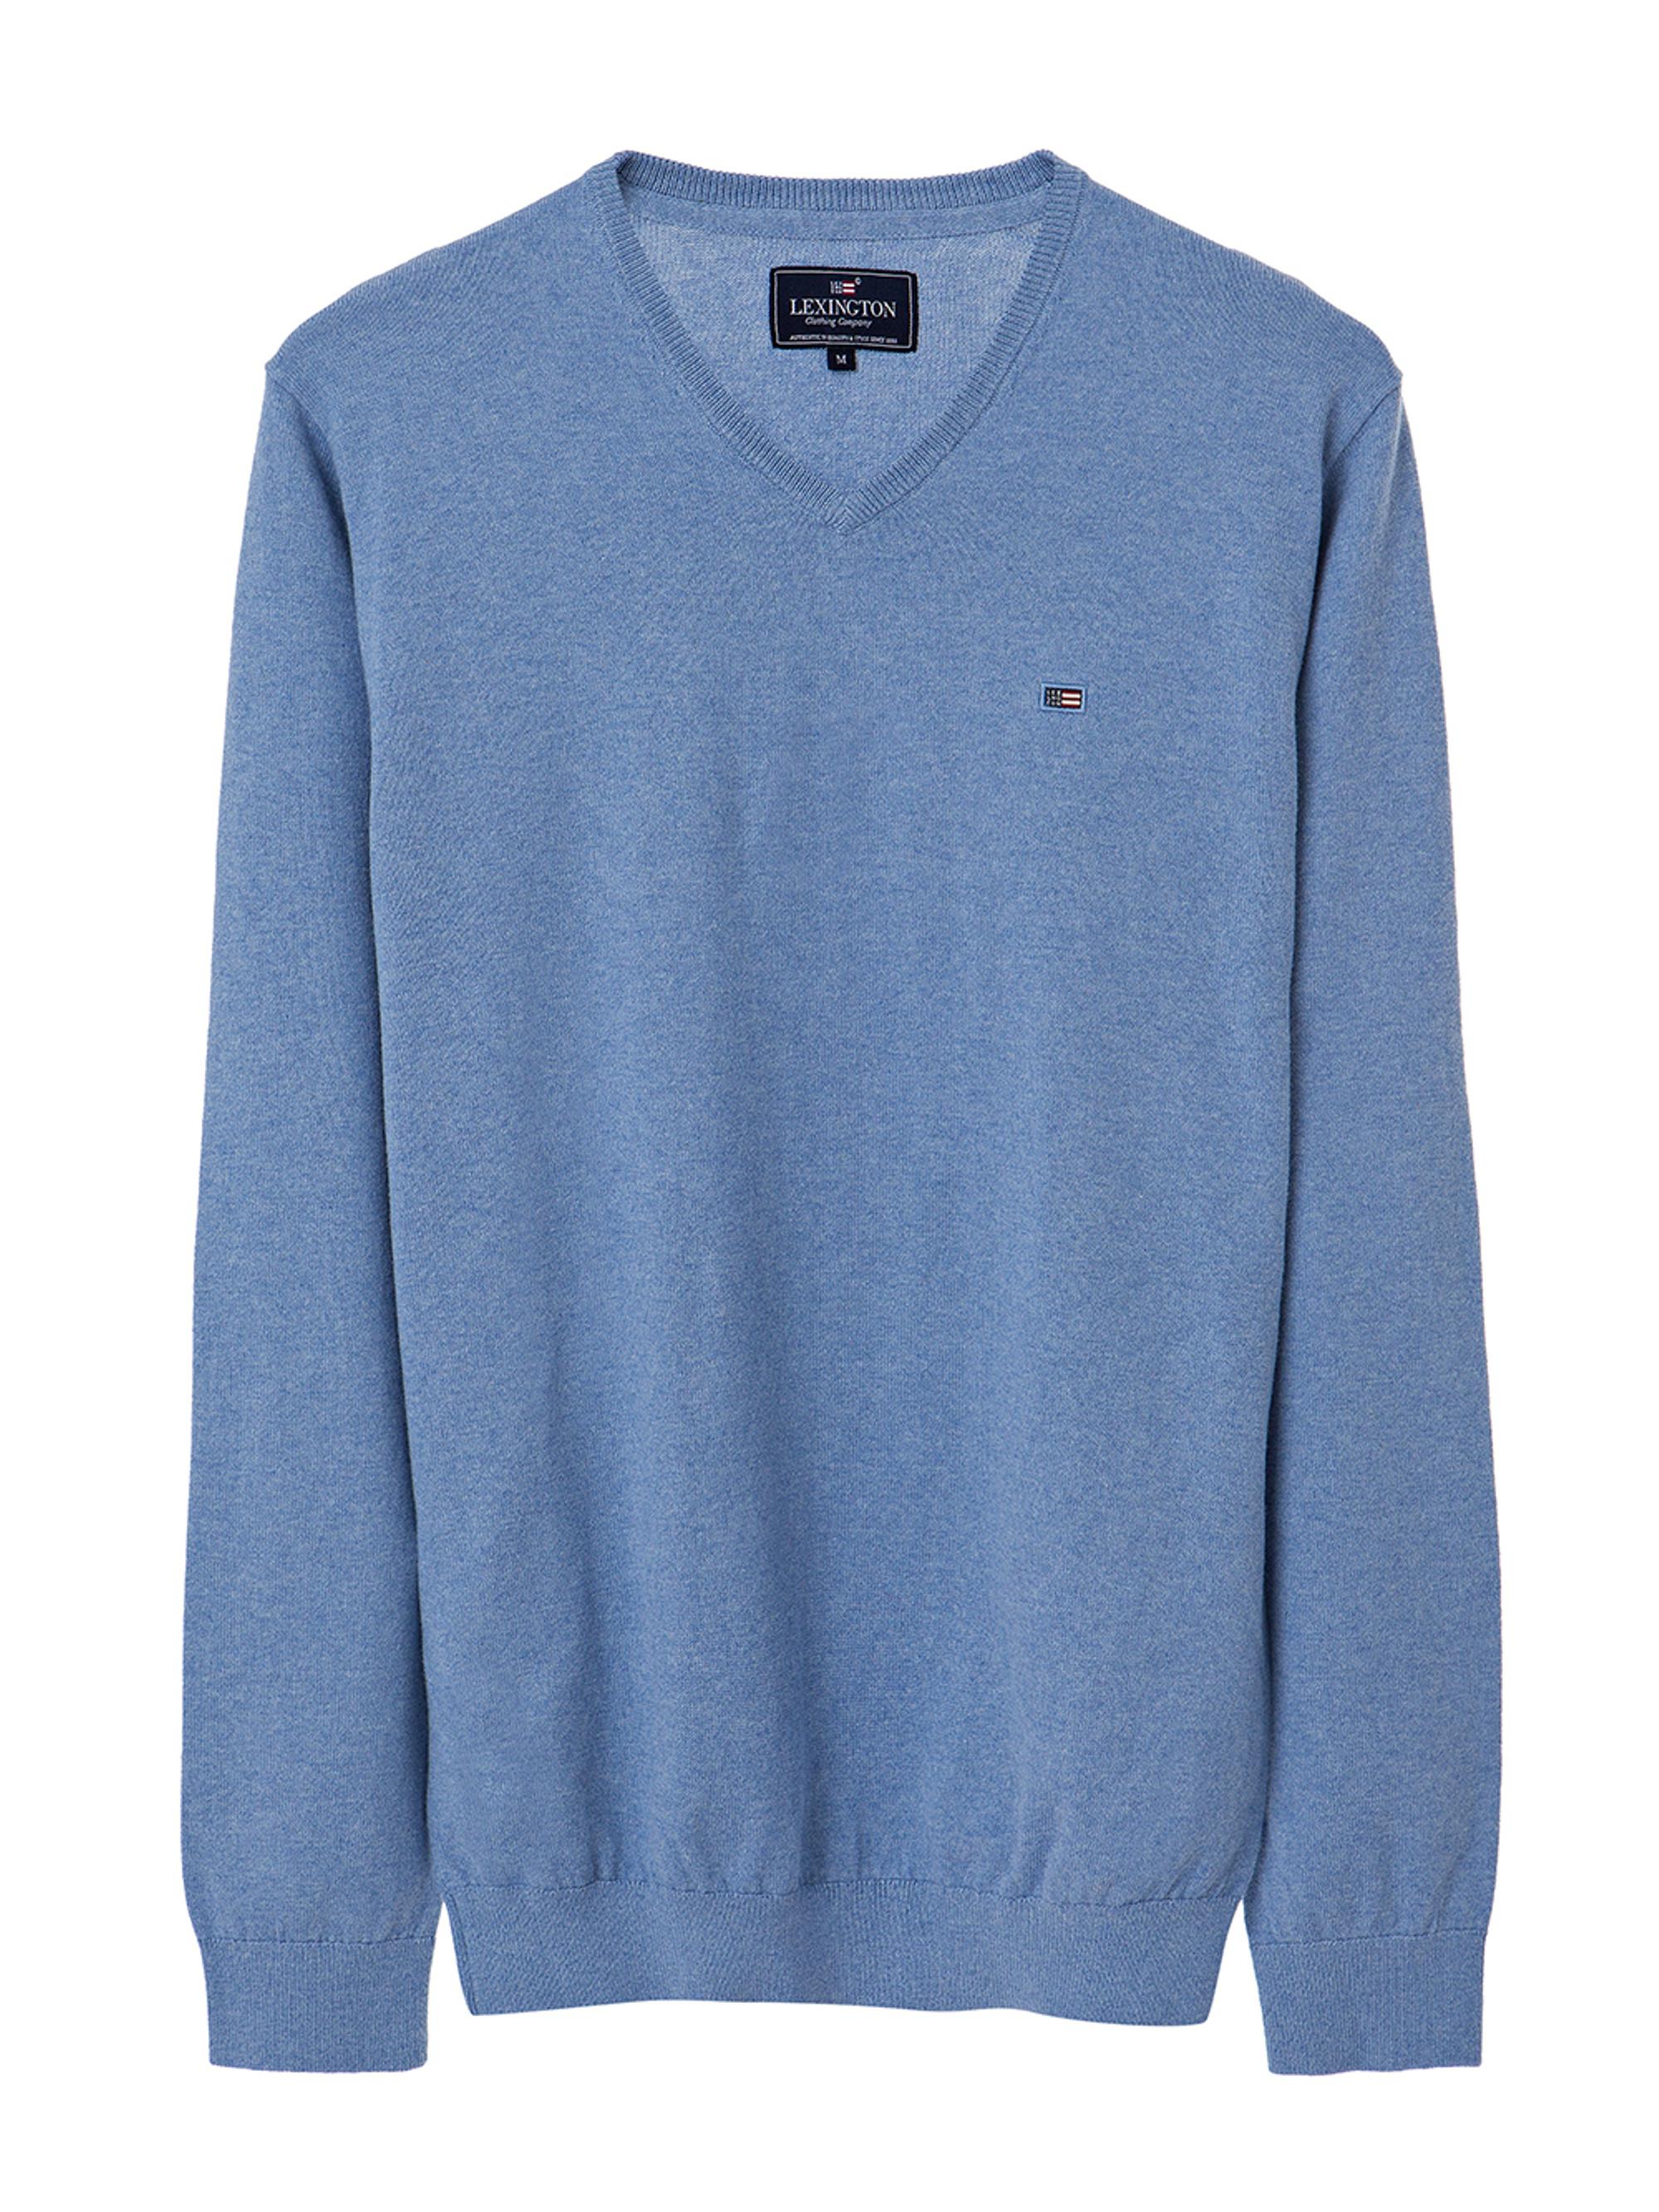 V-Neck Sweater, Light Blue